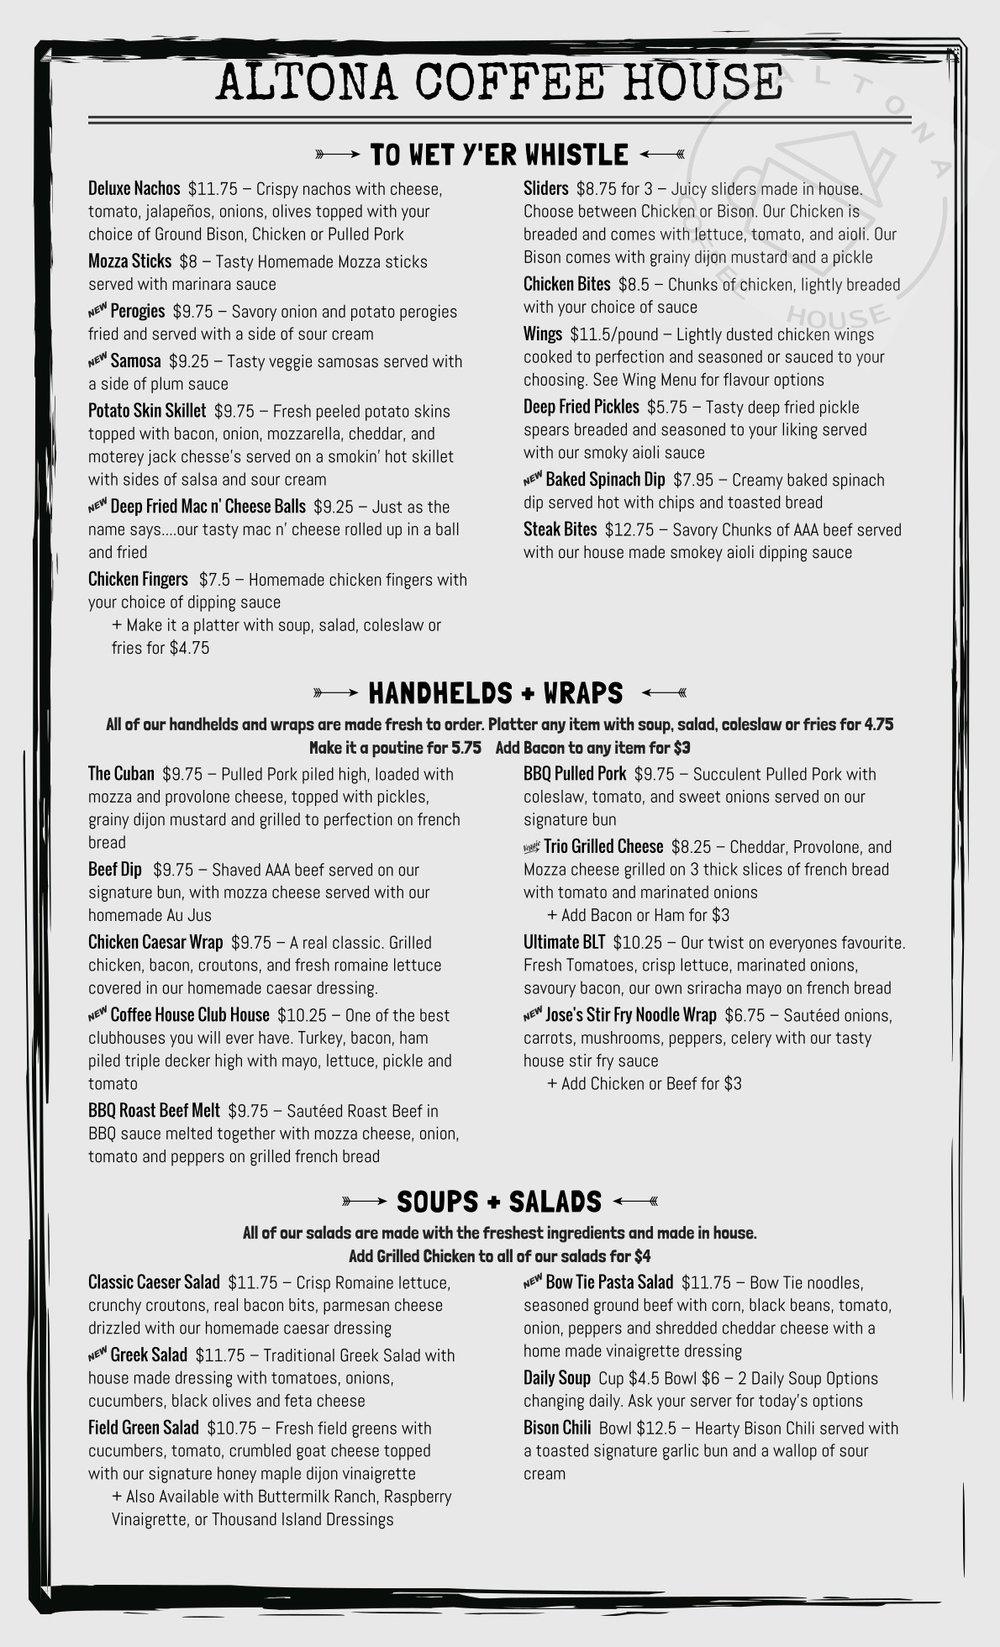 Coffee House Menu 11.18 PG1_page-1.jpg